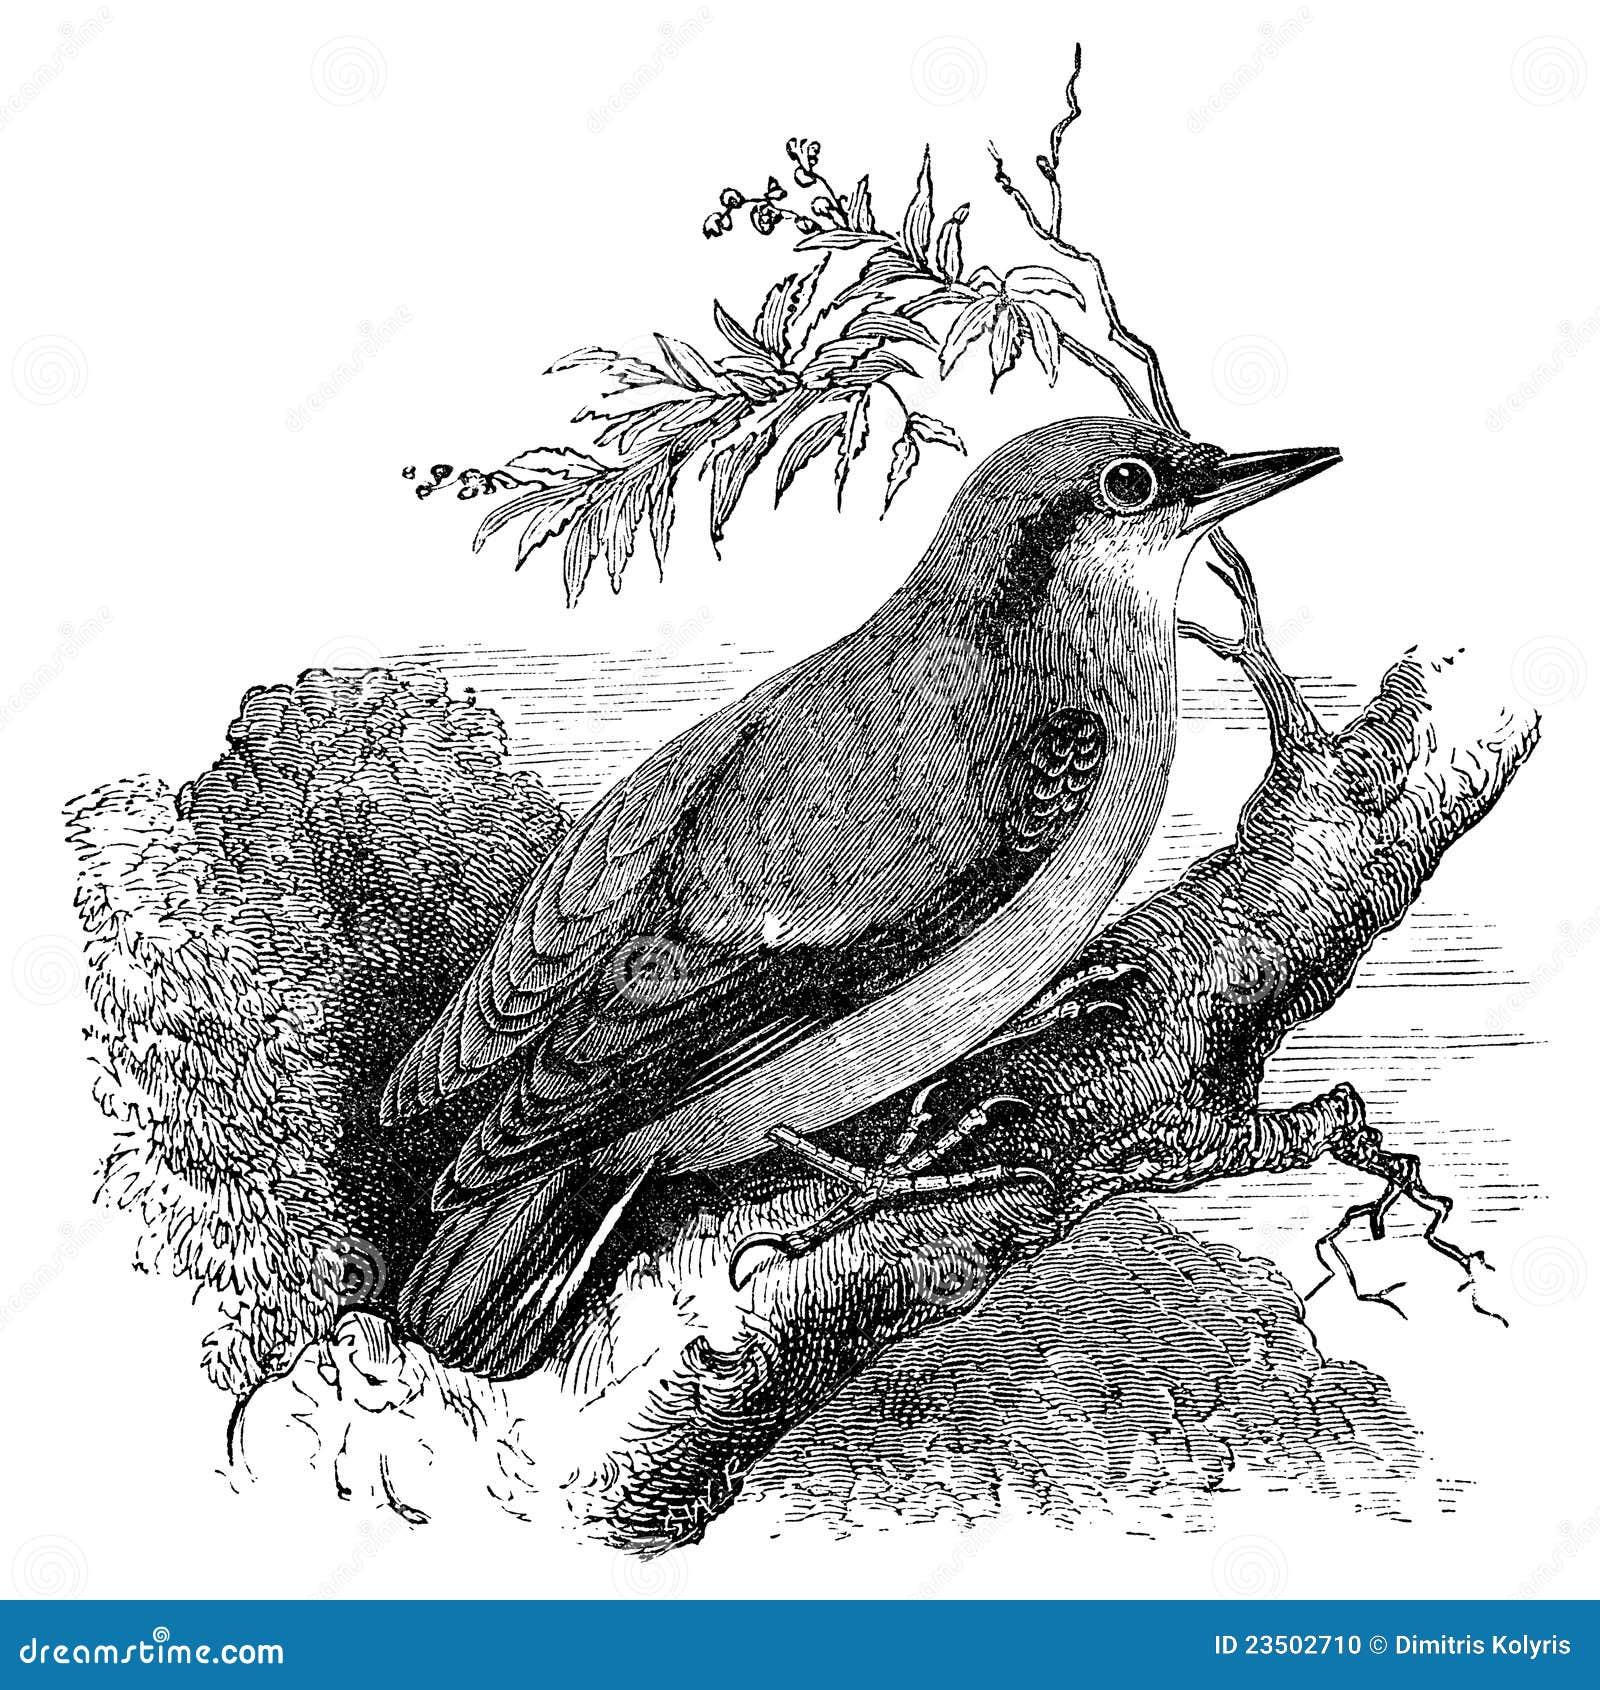 Flying bird illustration vintage - photo#24